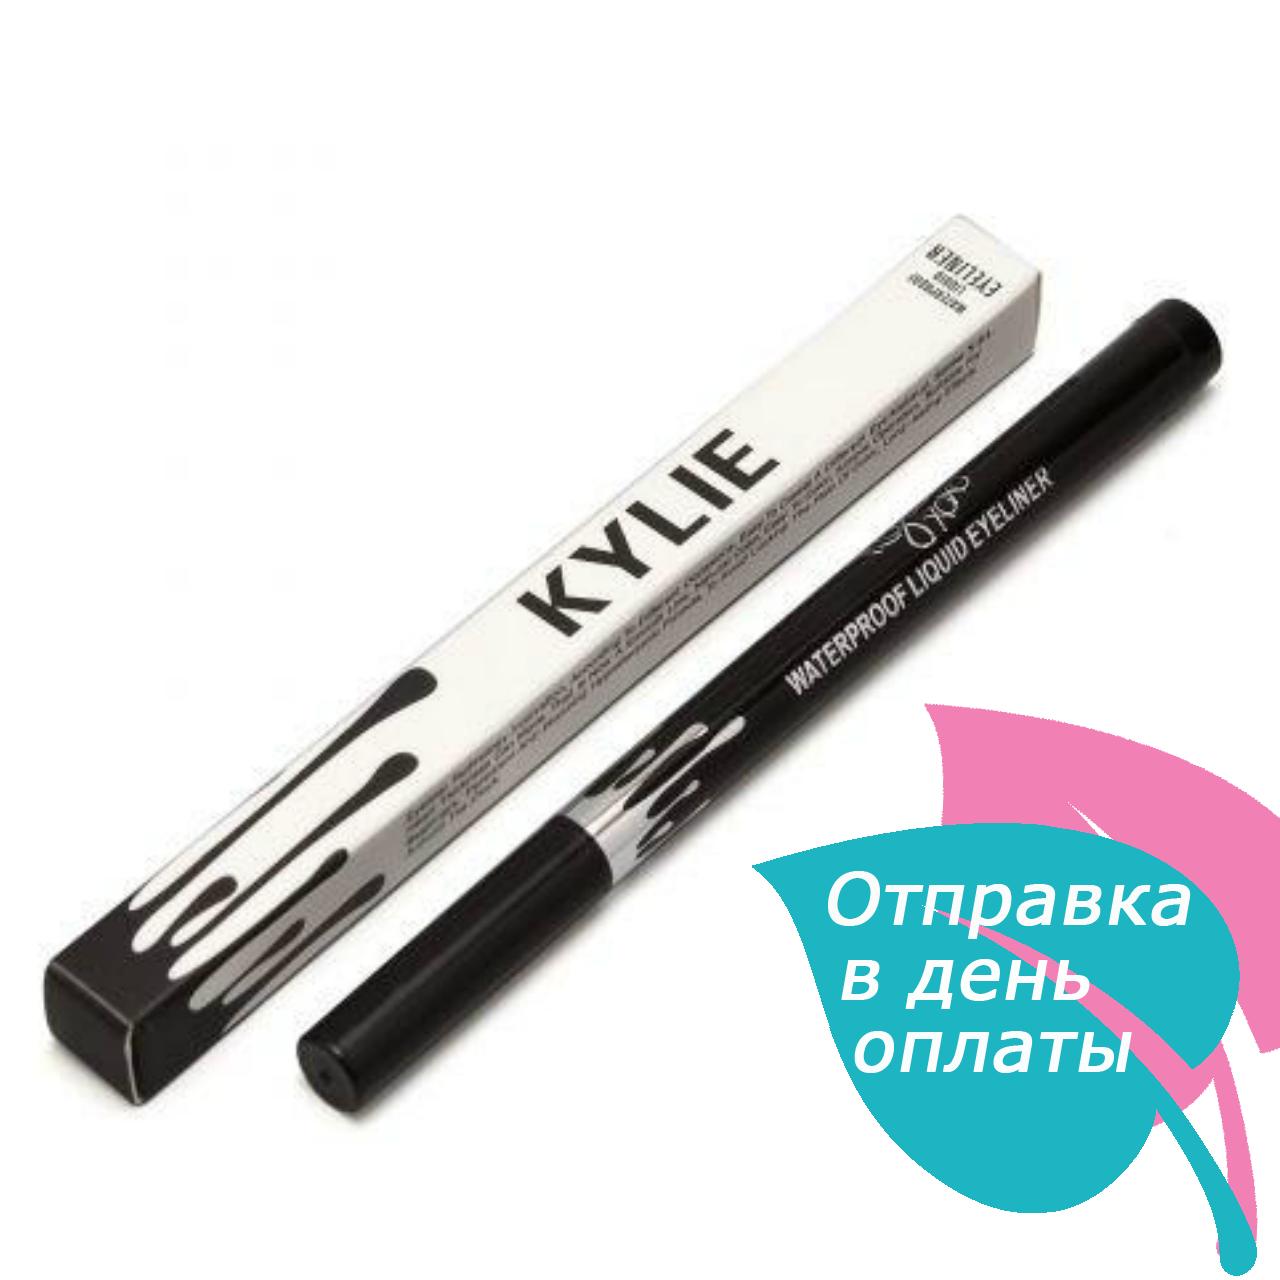 Подводка для век KYLIE Pencil waterproof liquid eyeliner, 0.55ml / 0.019oz